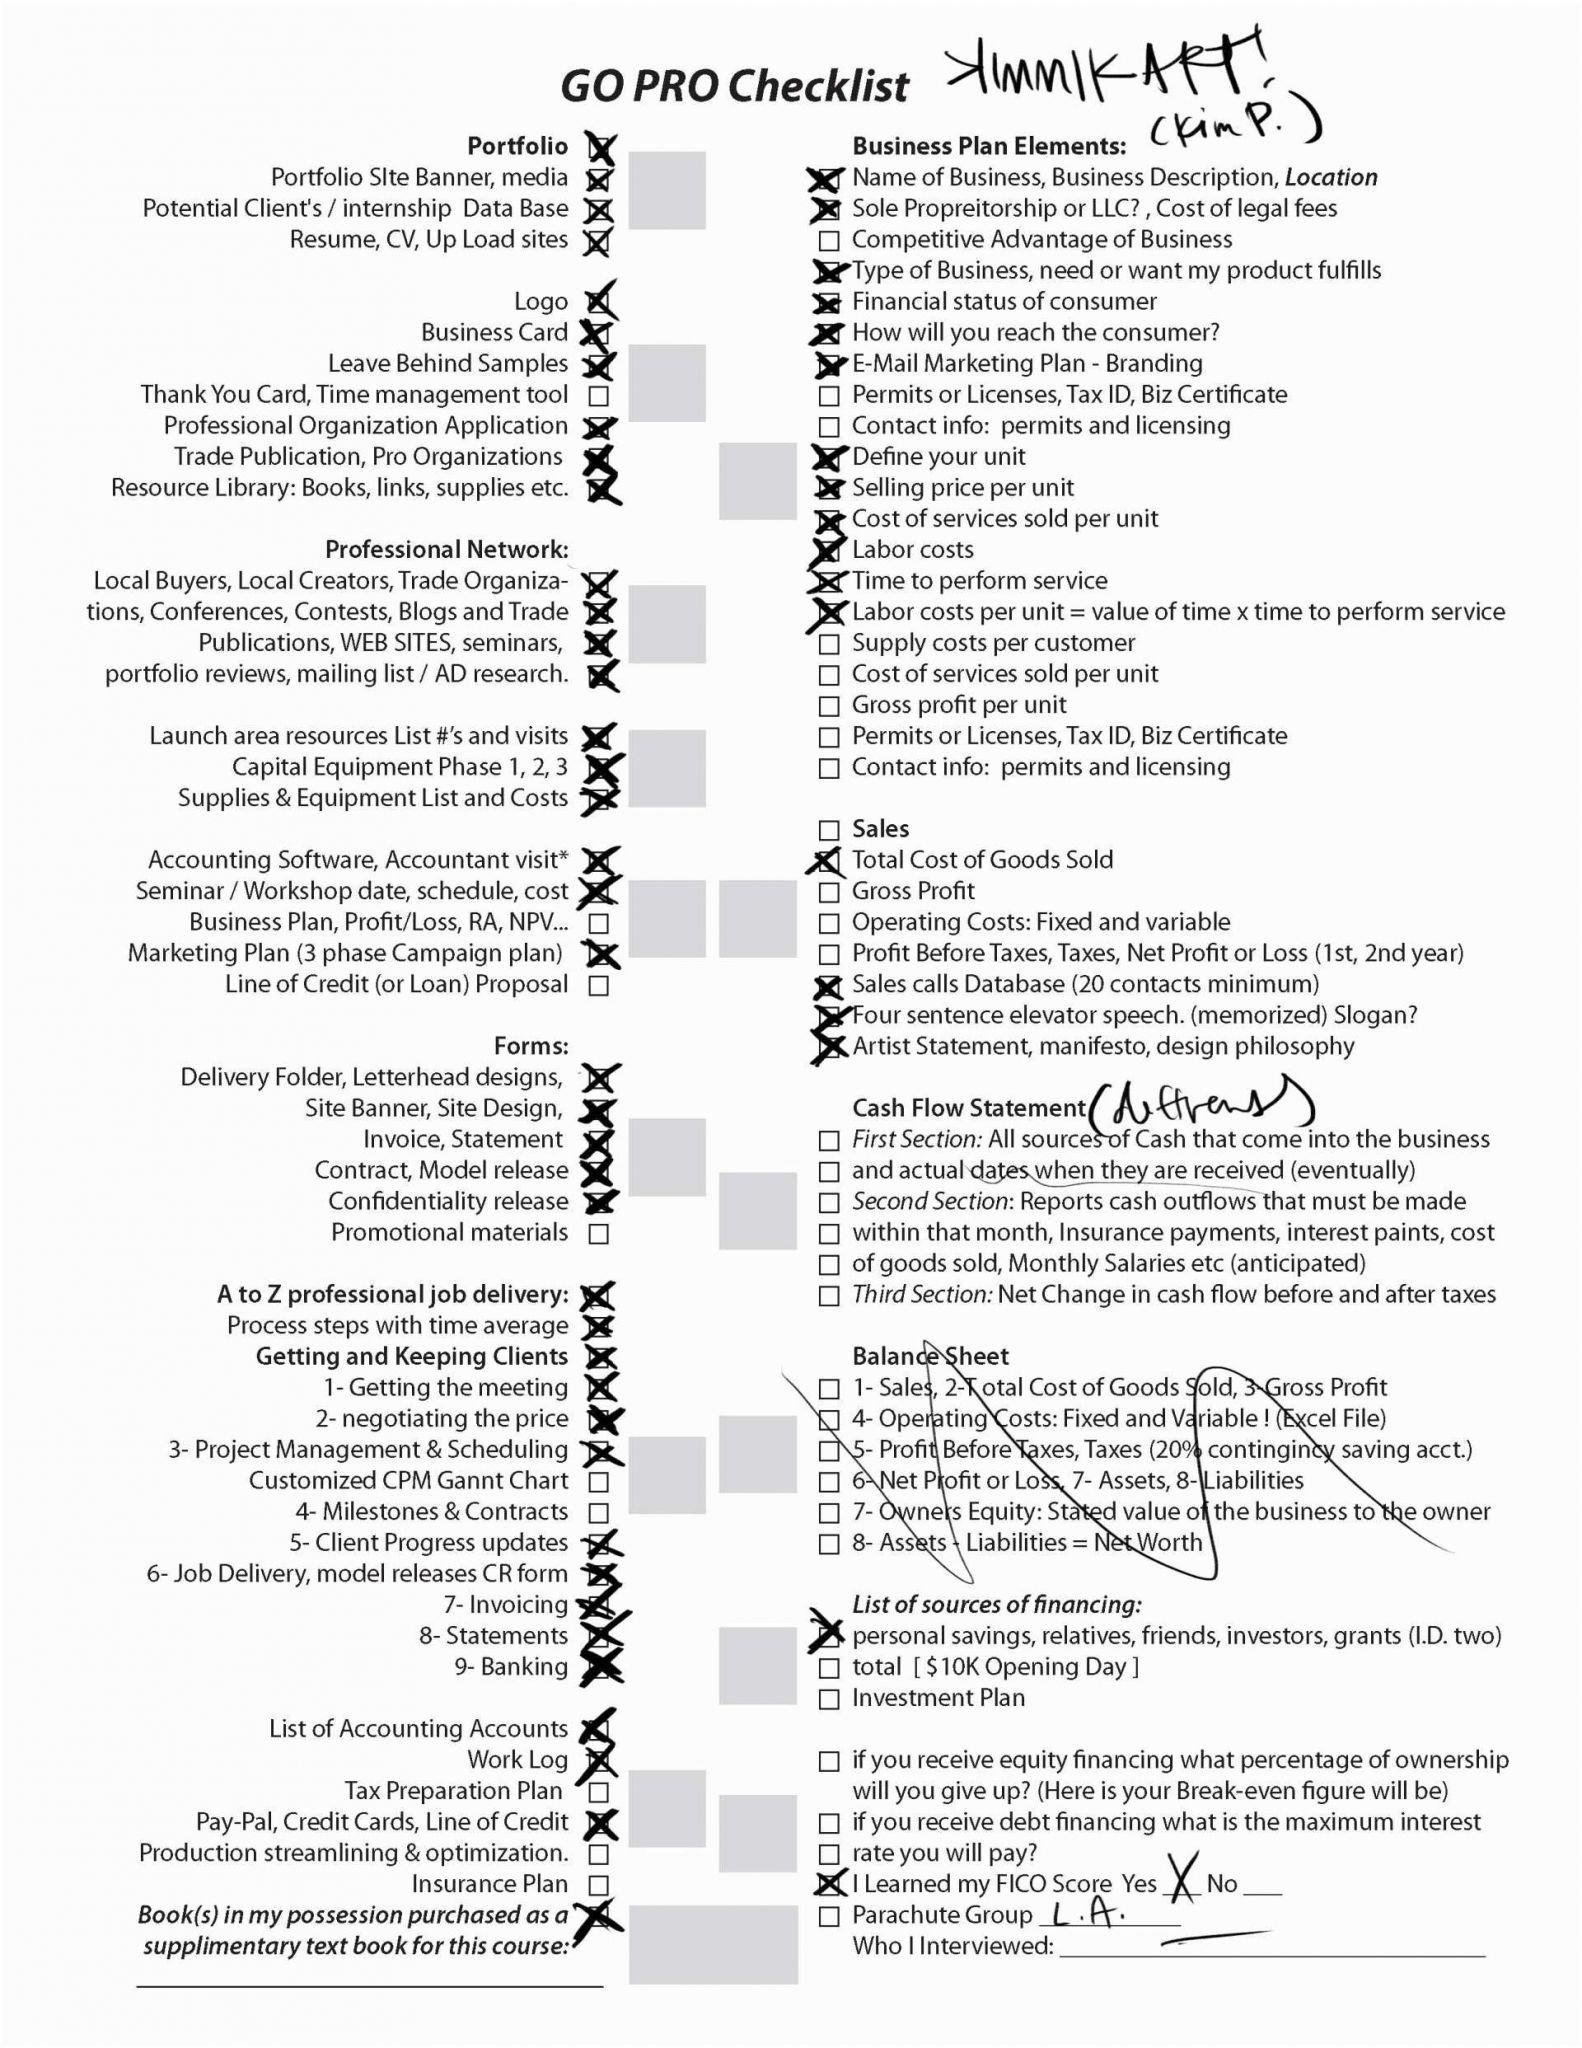 S9 Electromagnetic Spectrum Worksheet  Briefencounters Pertaining To S9 Electromagnetic Spectrum Worksheet